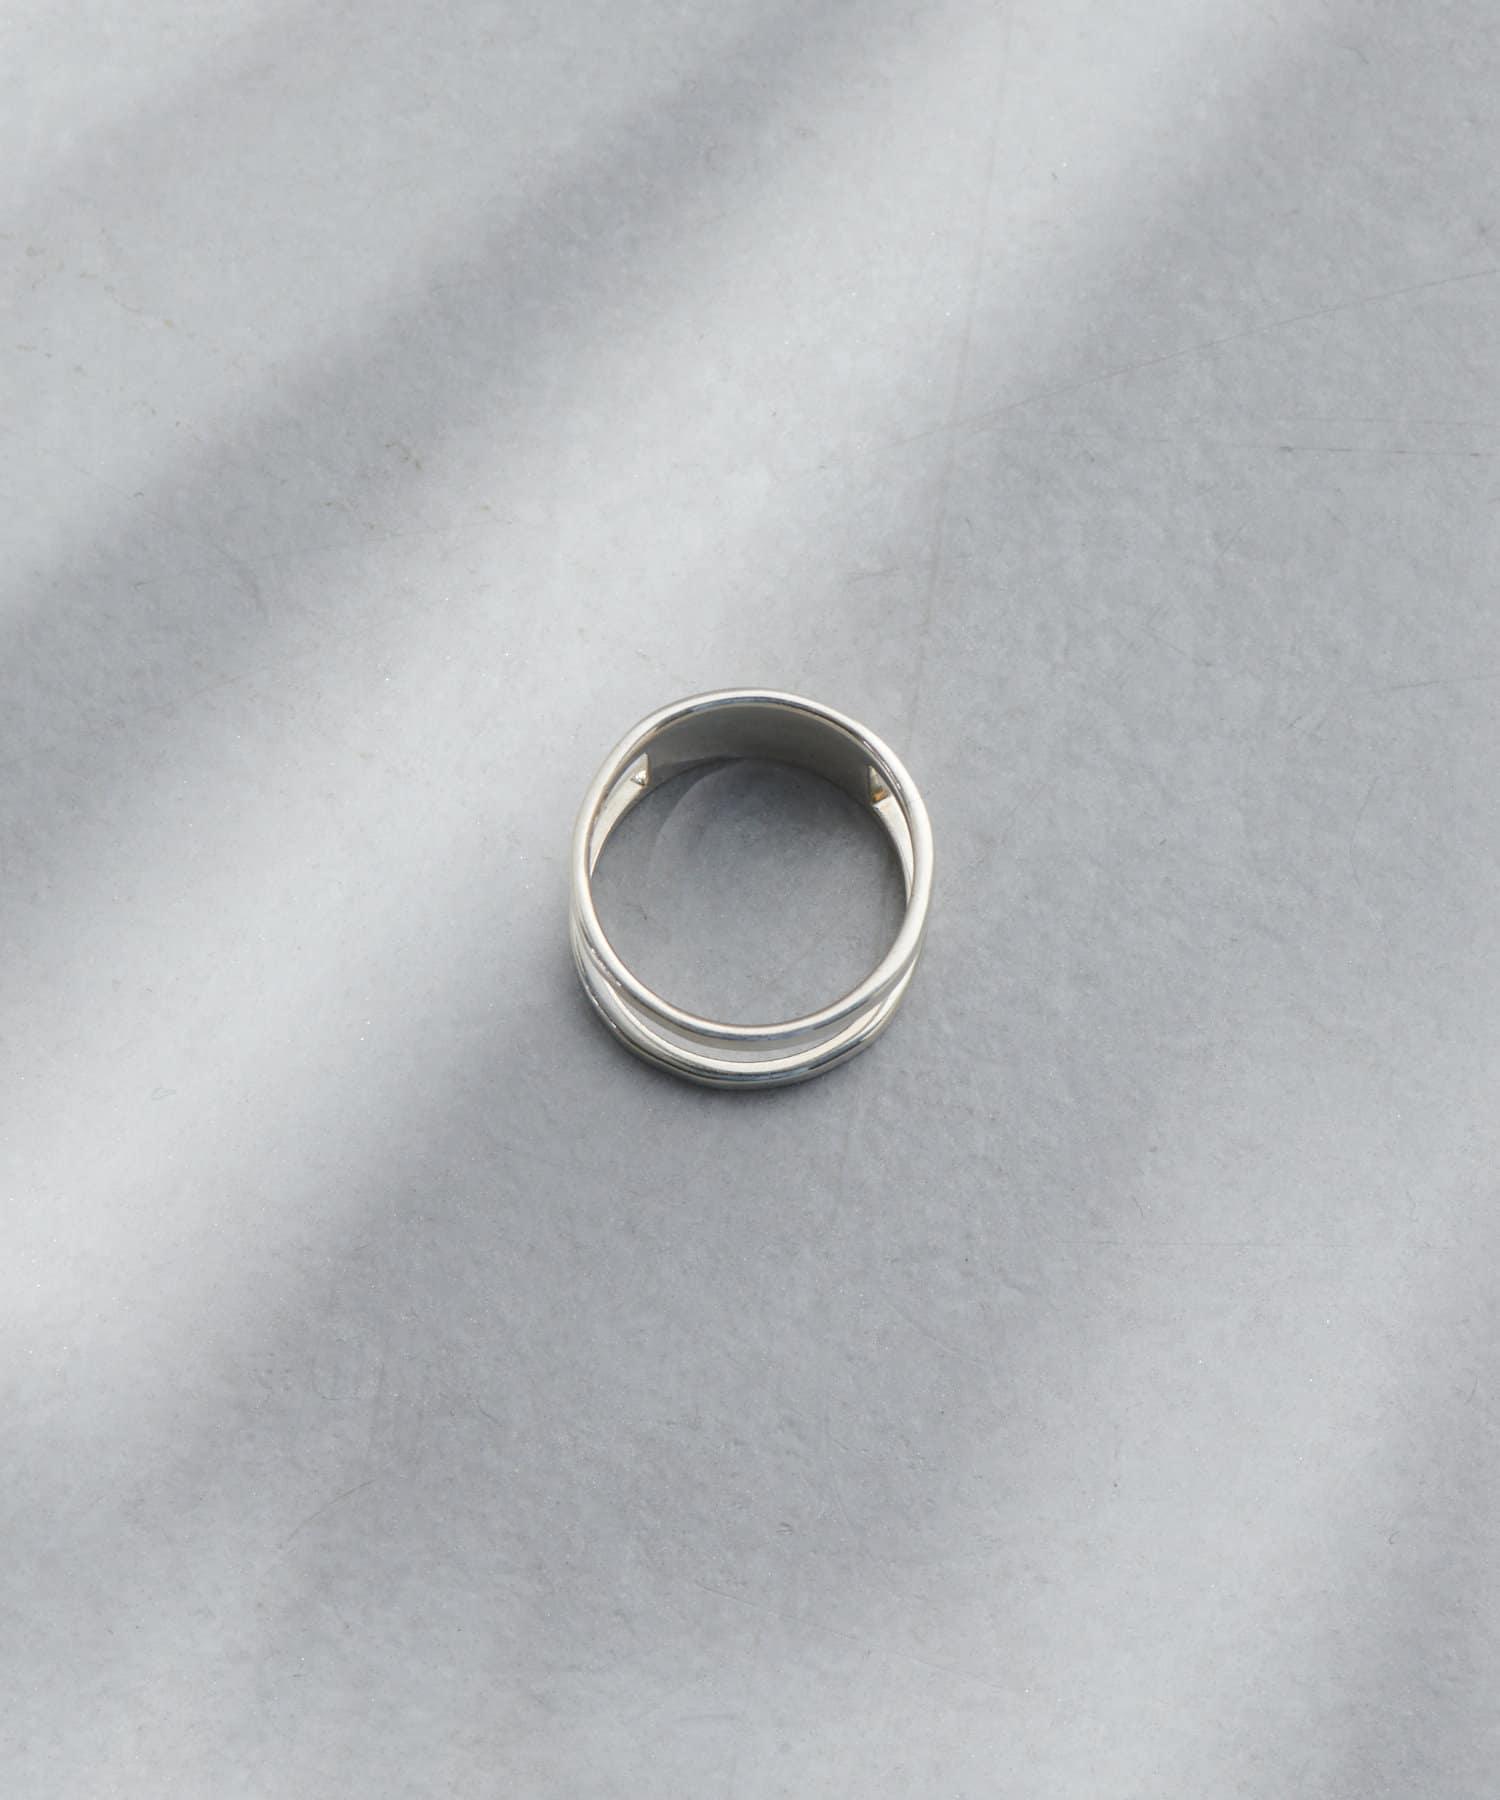 Discoat(ディスコート) AZ double bar ring